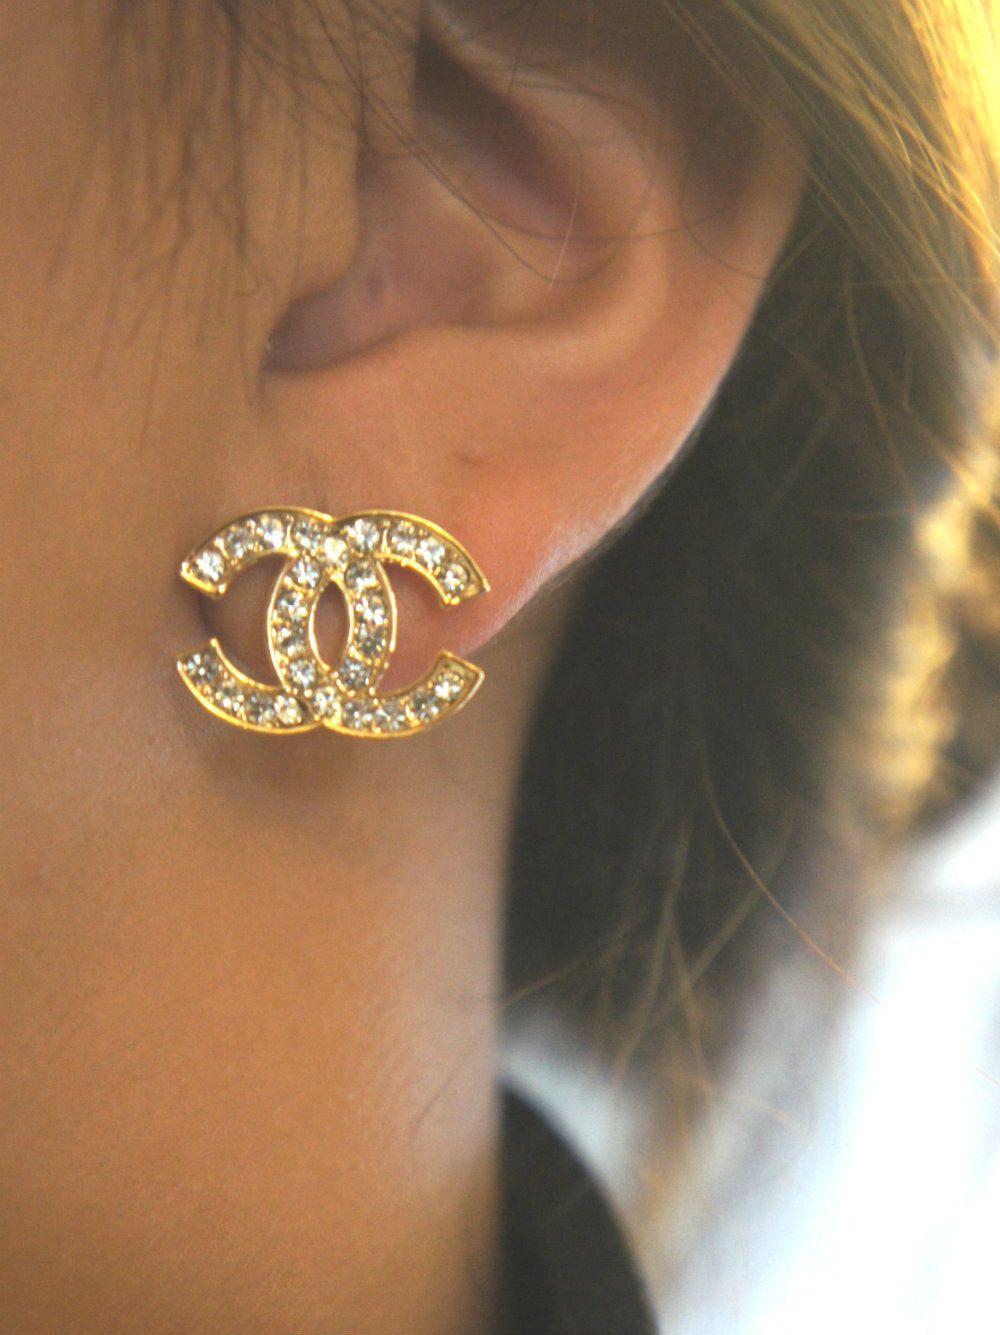 e128a0c92 studded chanel inspired earrings. $20.50, via Etsy. | Fashion ...